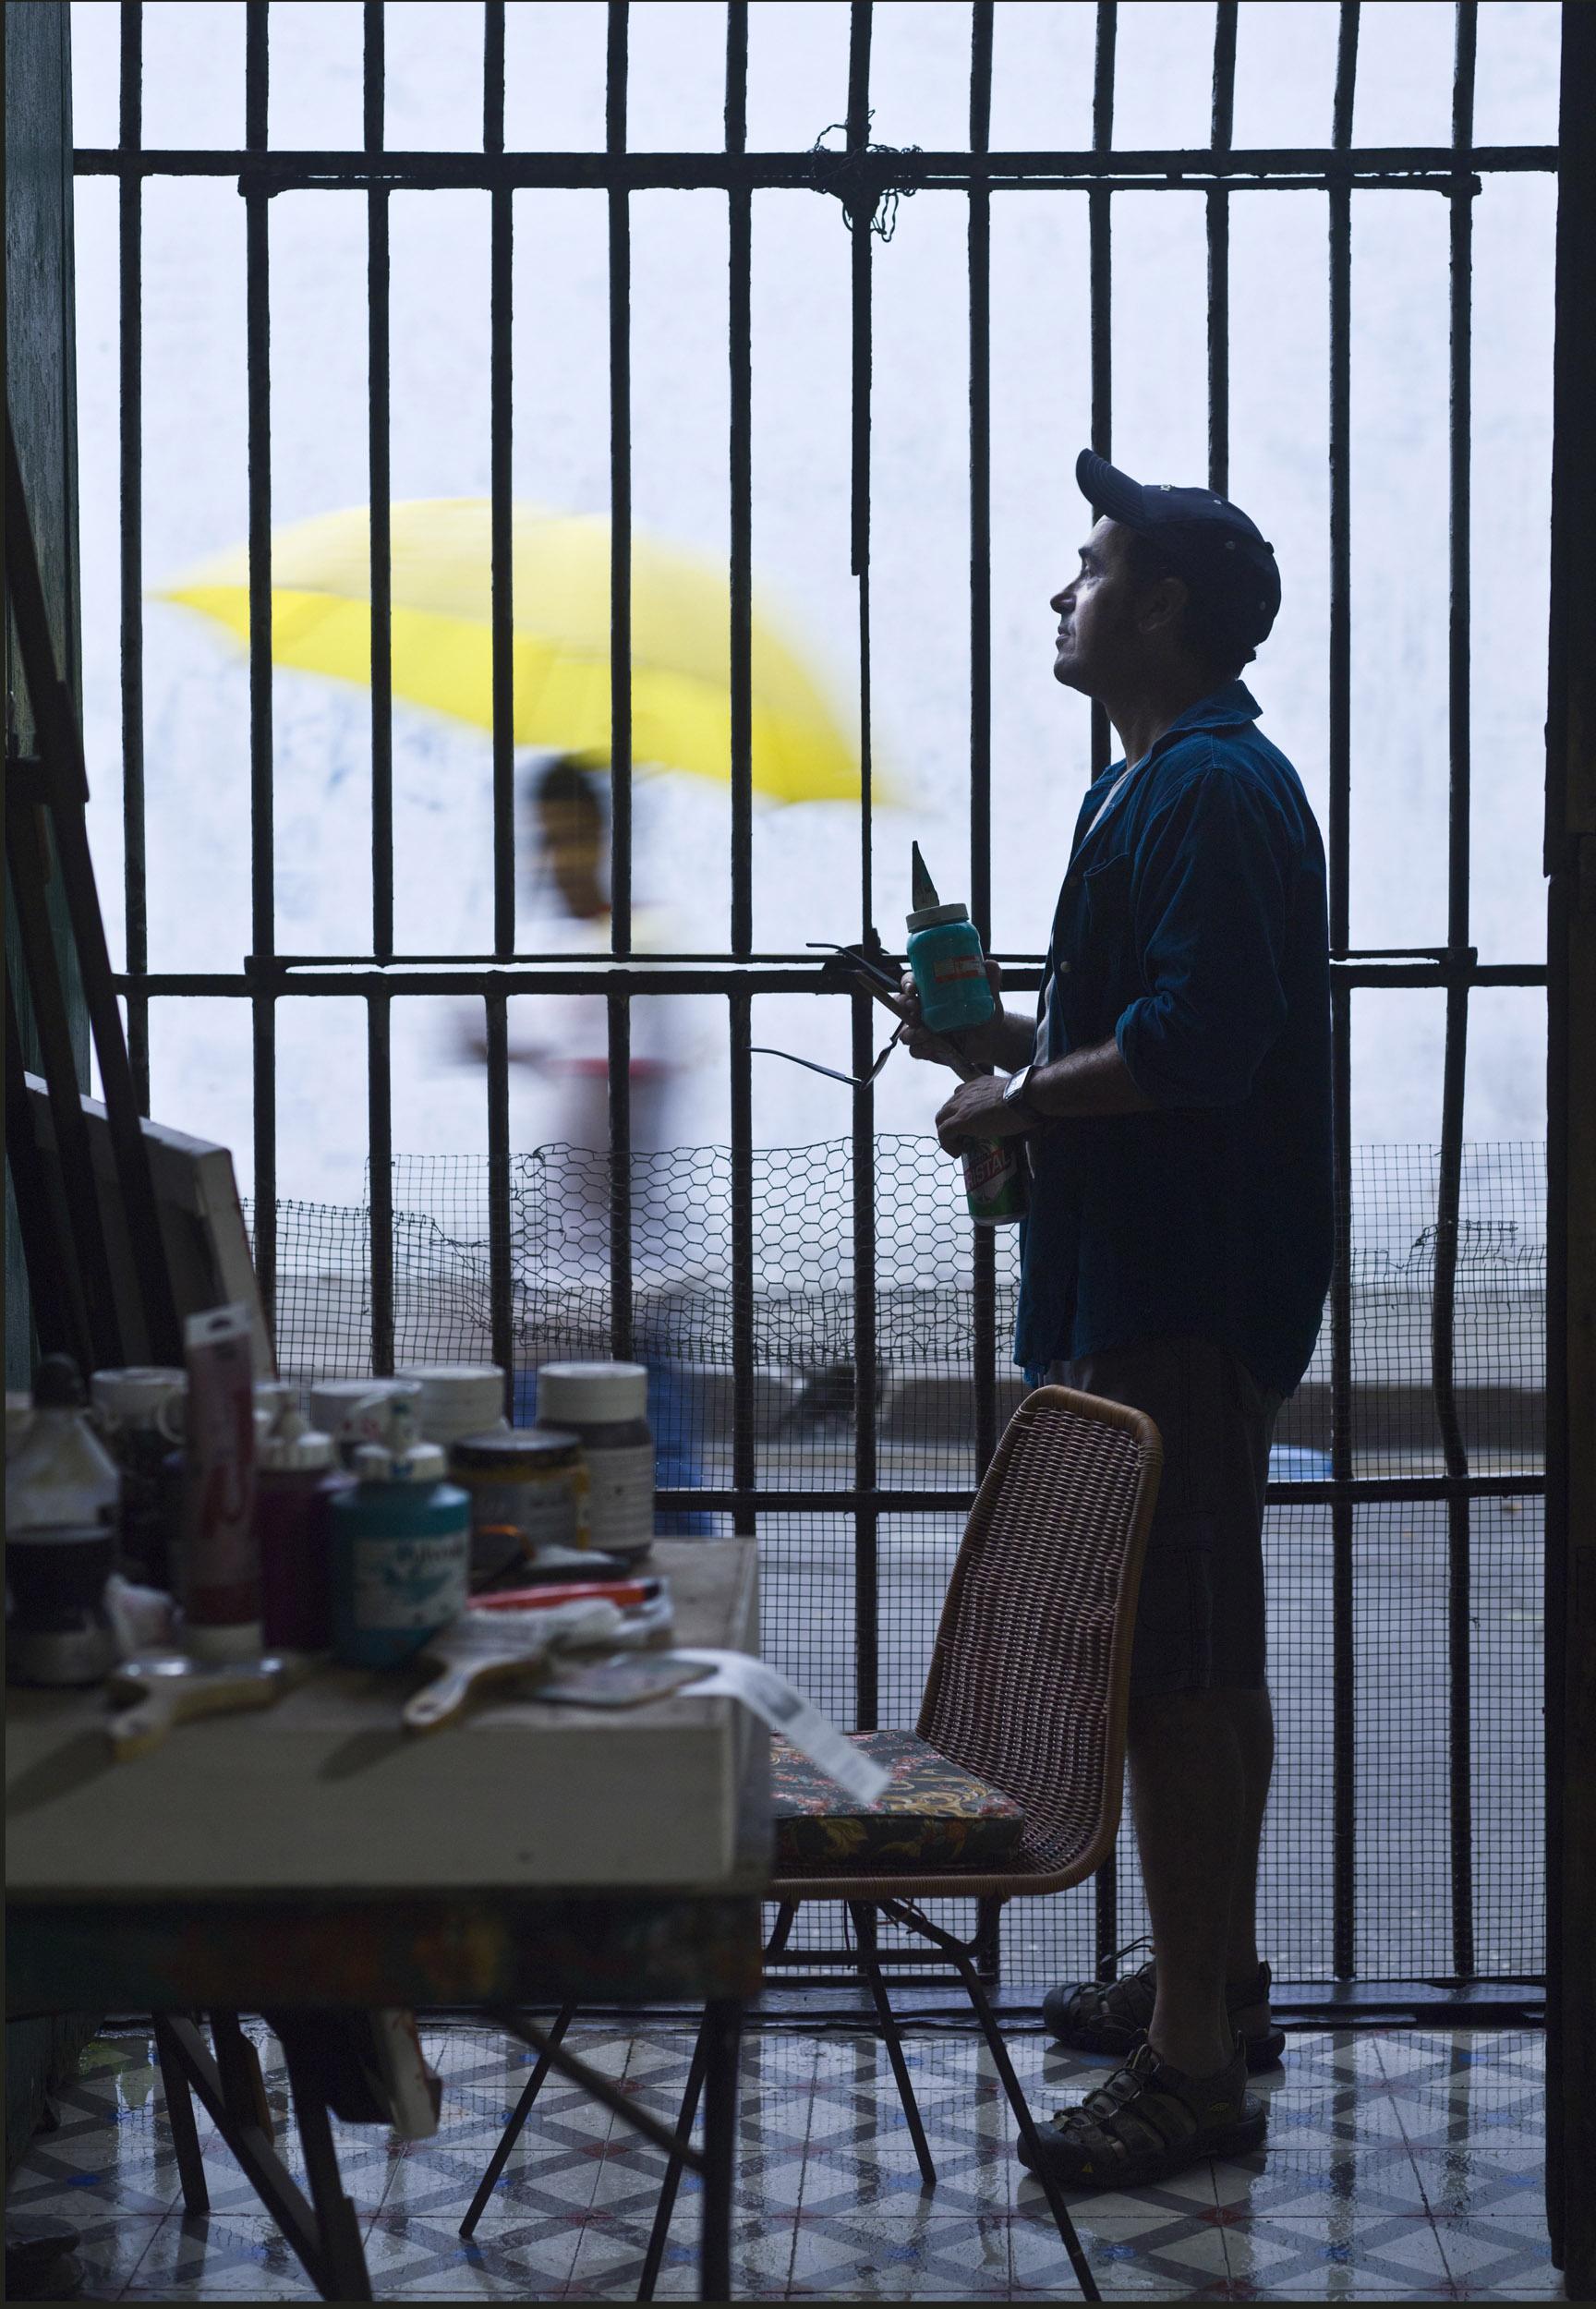 Eduardo Abela, painter - Illuminated Cuba - Hector Garrido, Aerial and human photography